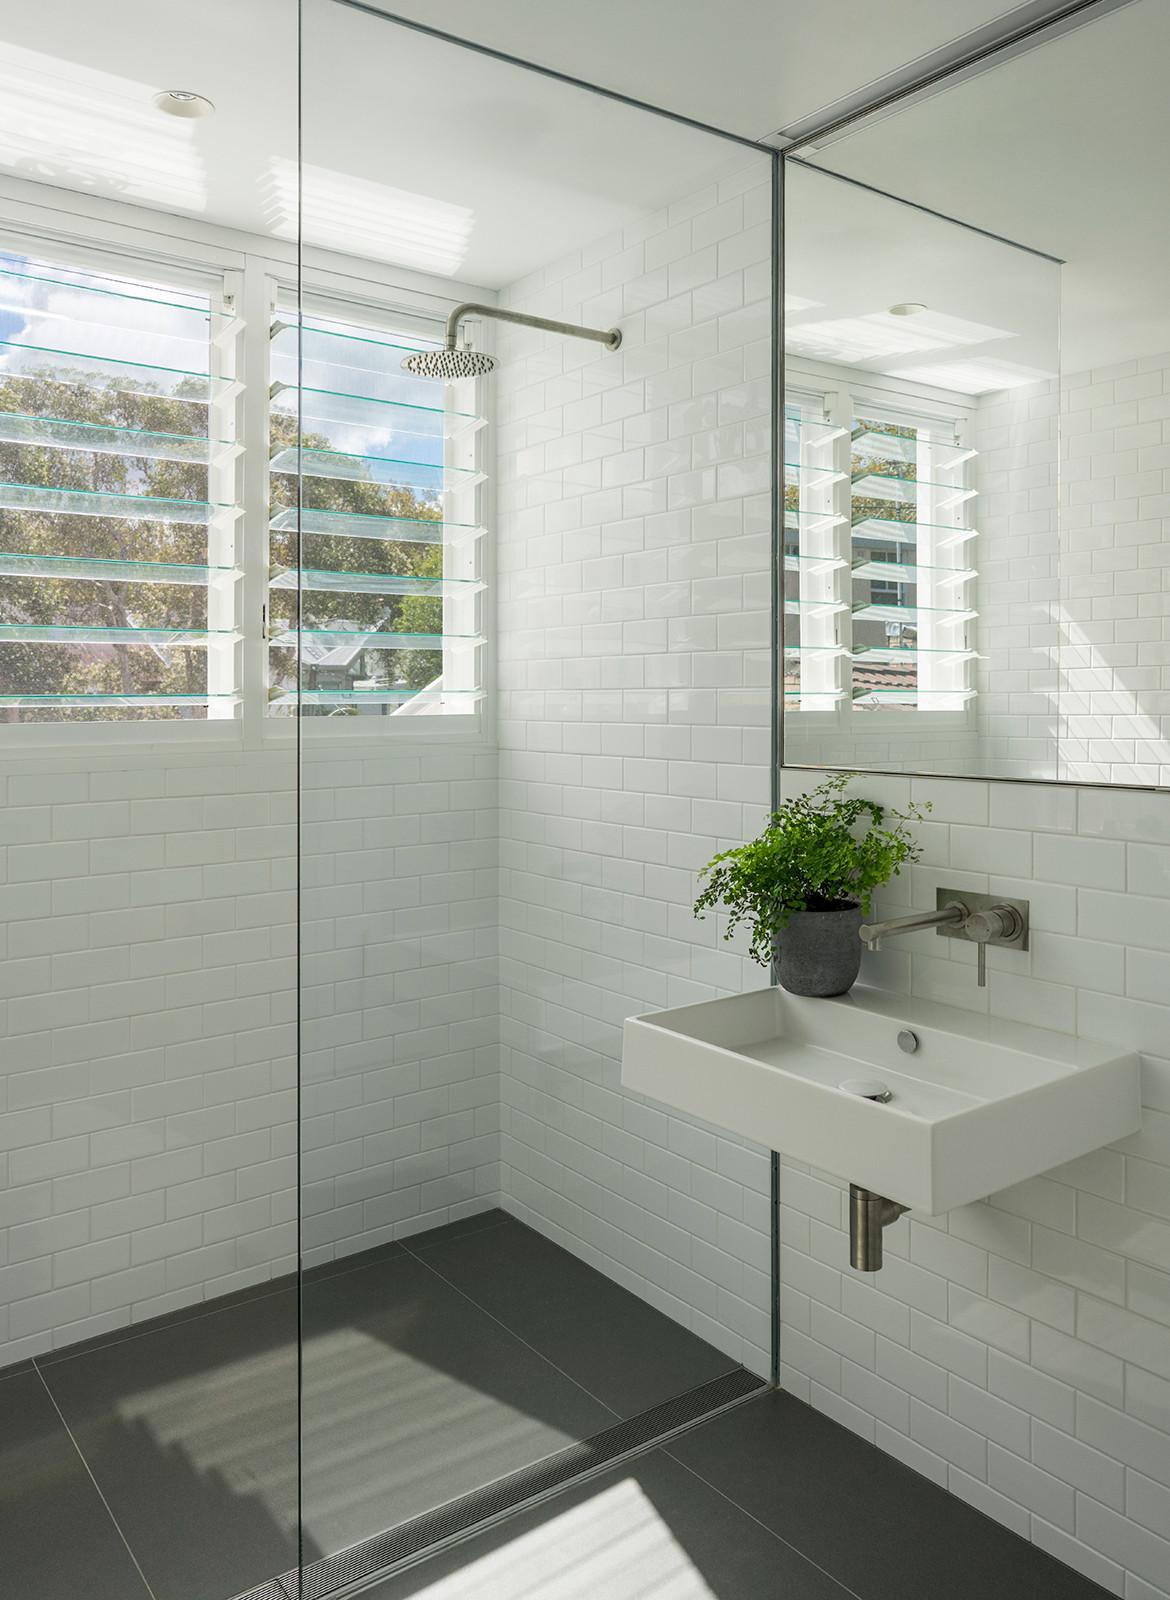 Hastings Van Nunen Ian Moore Architects CC Daniel Mayne bathroom